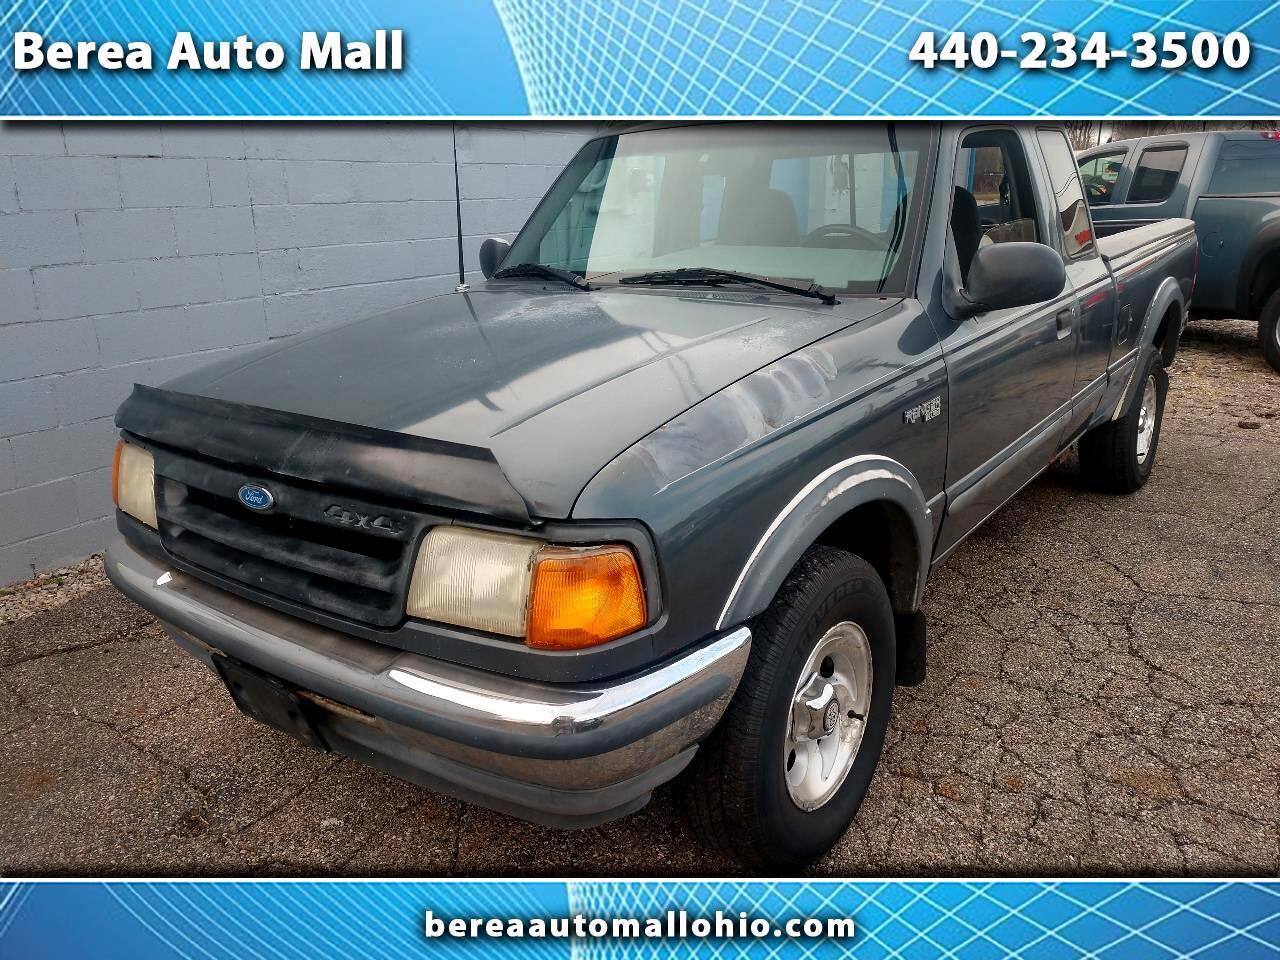 "1993 Ford Ranger Supercab Styleside 125"" WB XLT 4WD"